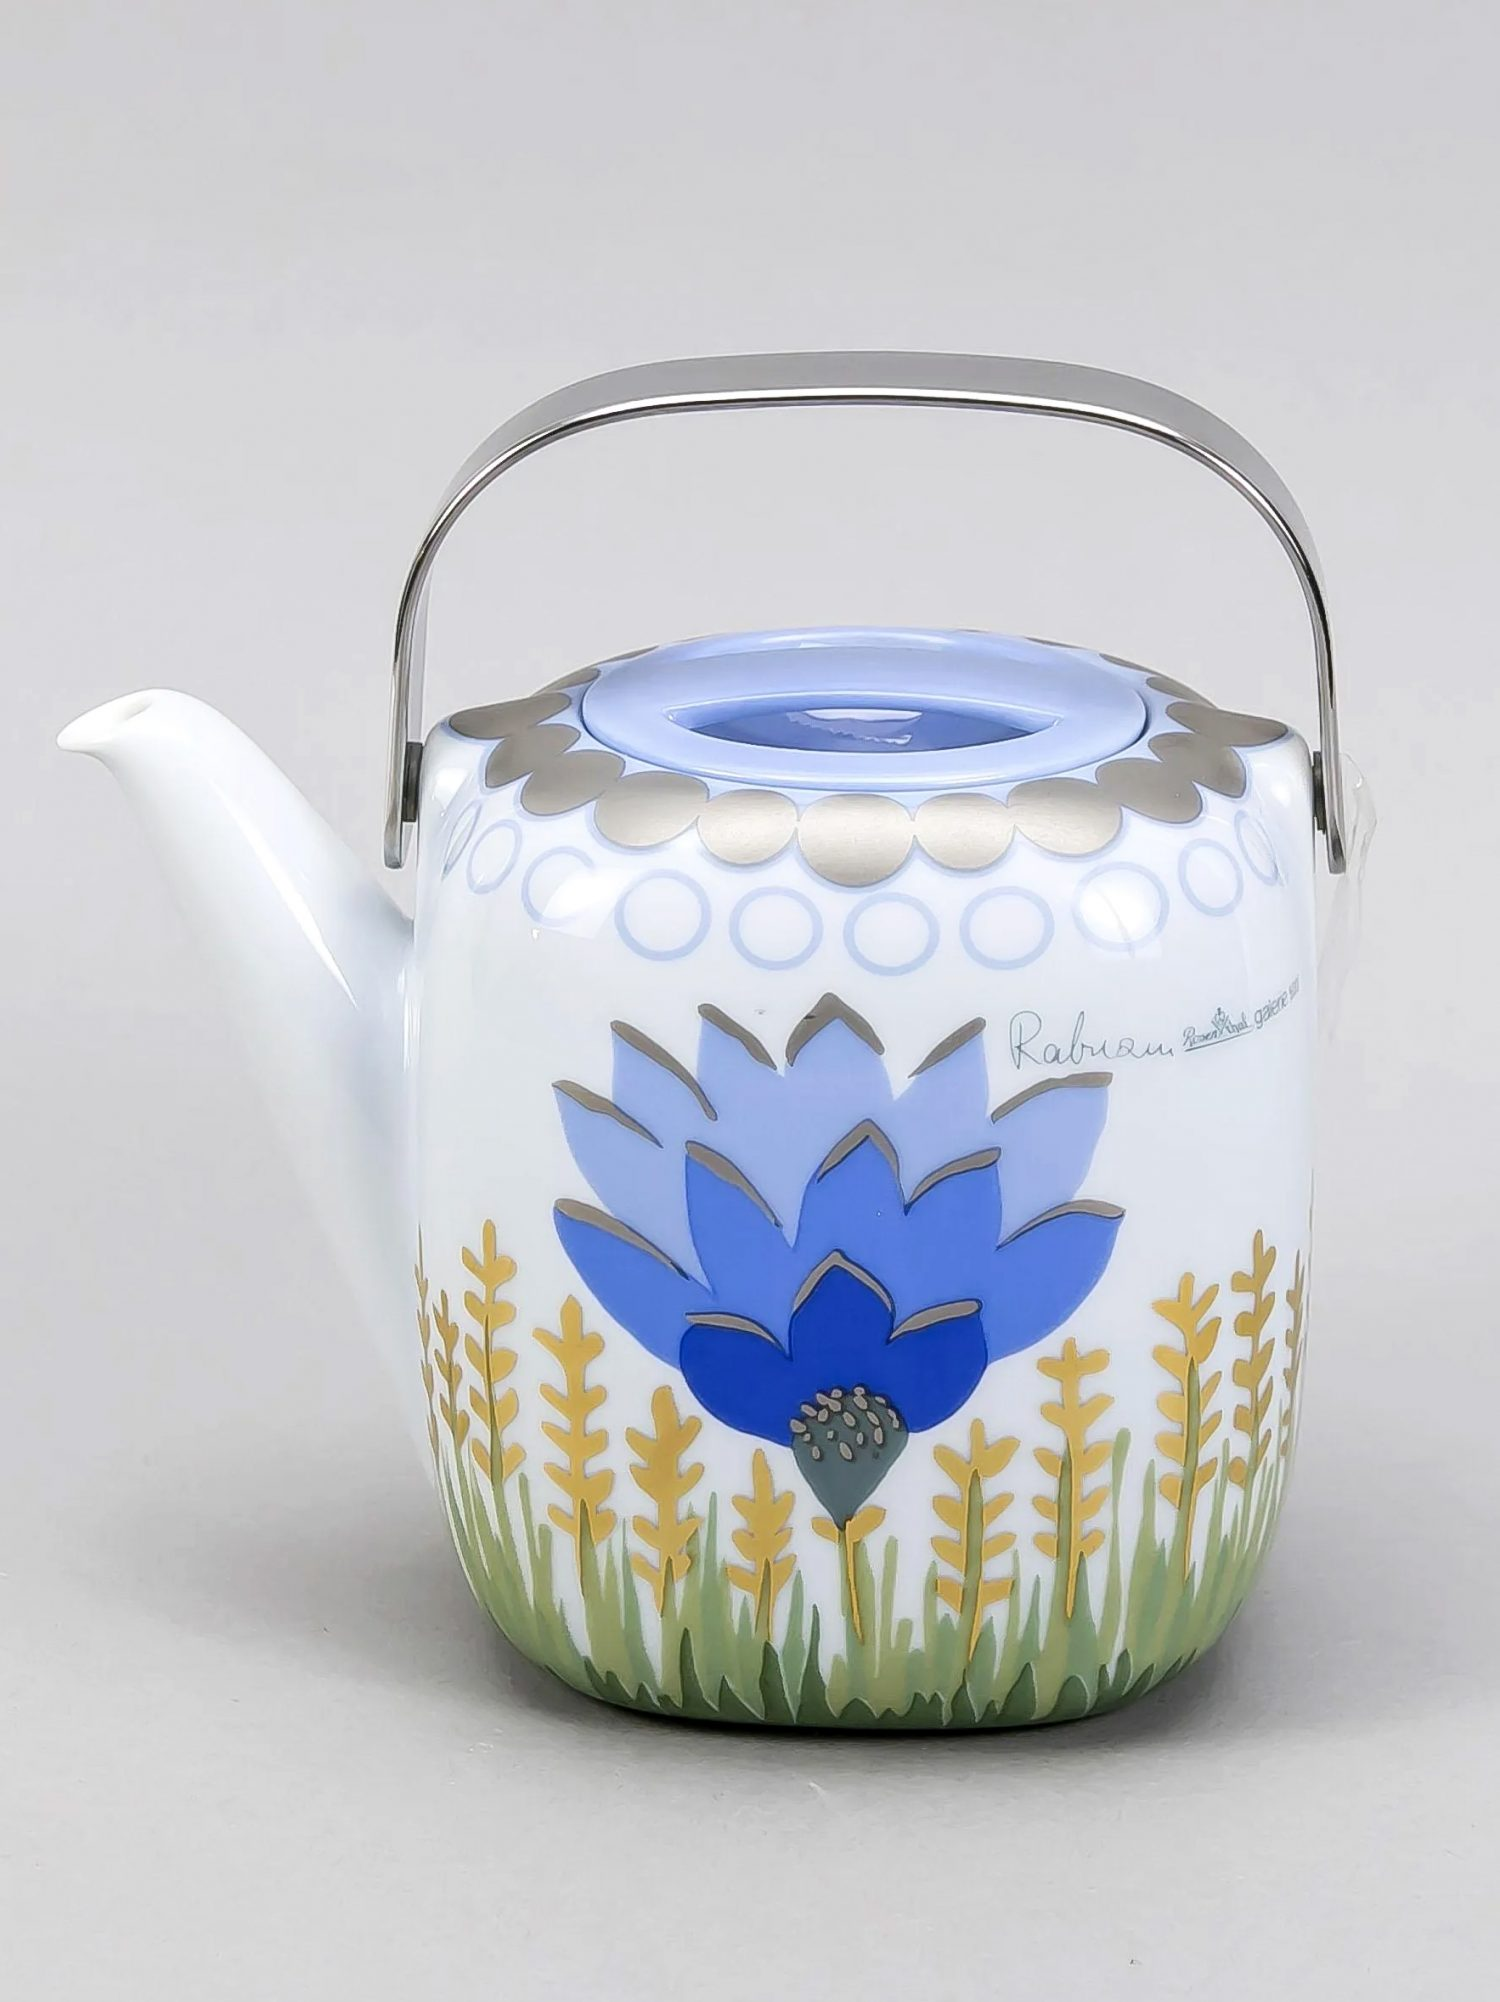 Rosenthal Teapot, Suomi Series, Decor by Ivan Rabuzin